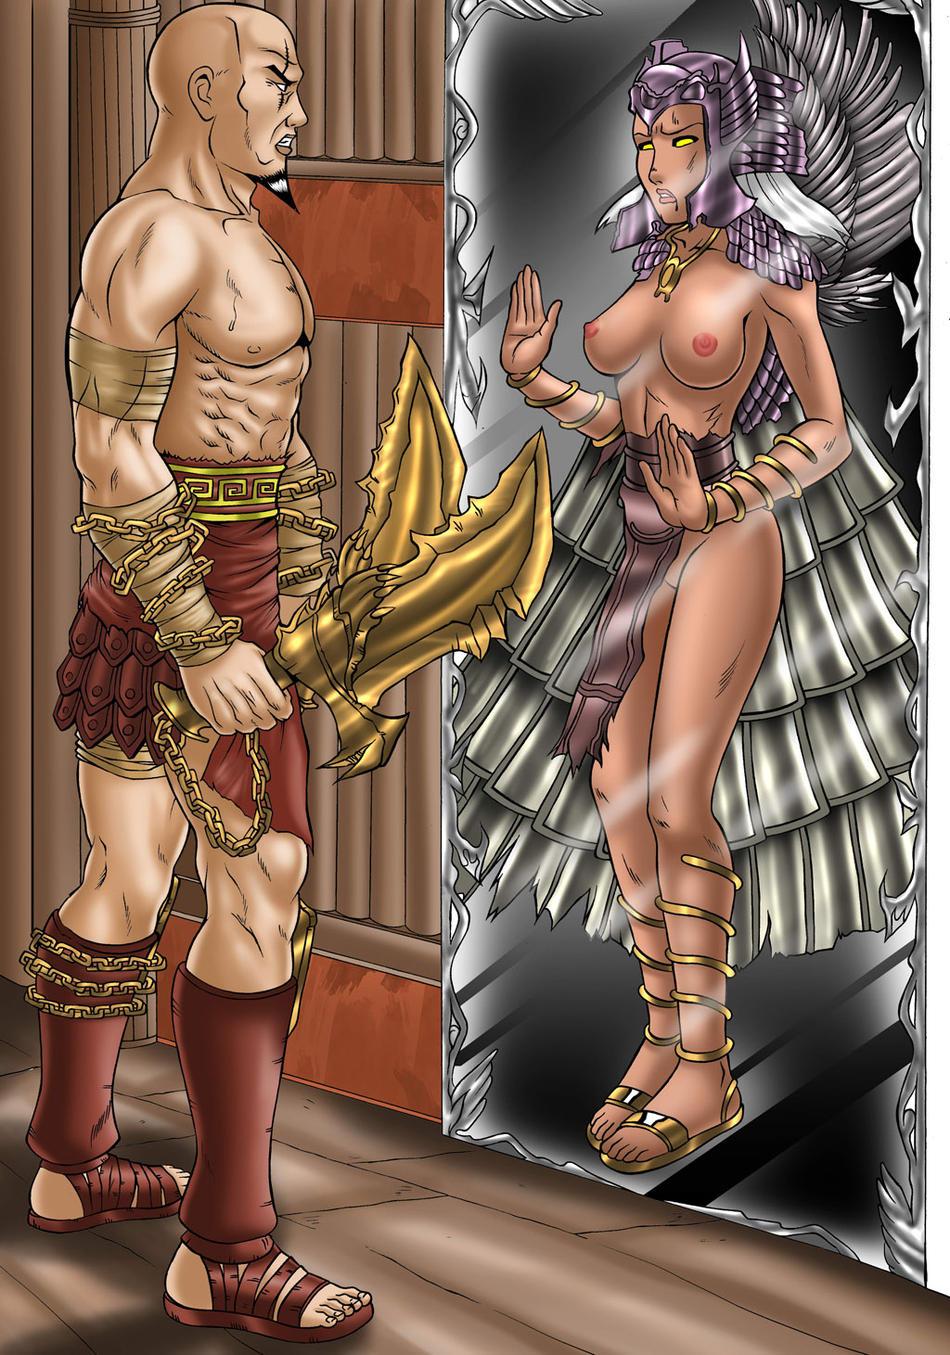 god war of hot aphrodite 3 Amazing world of gumball mrs simian